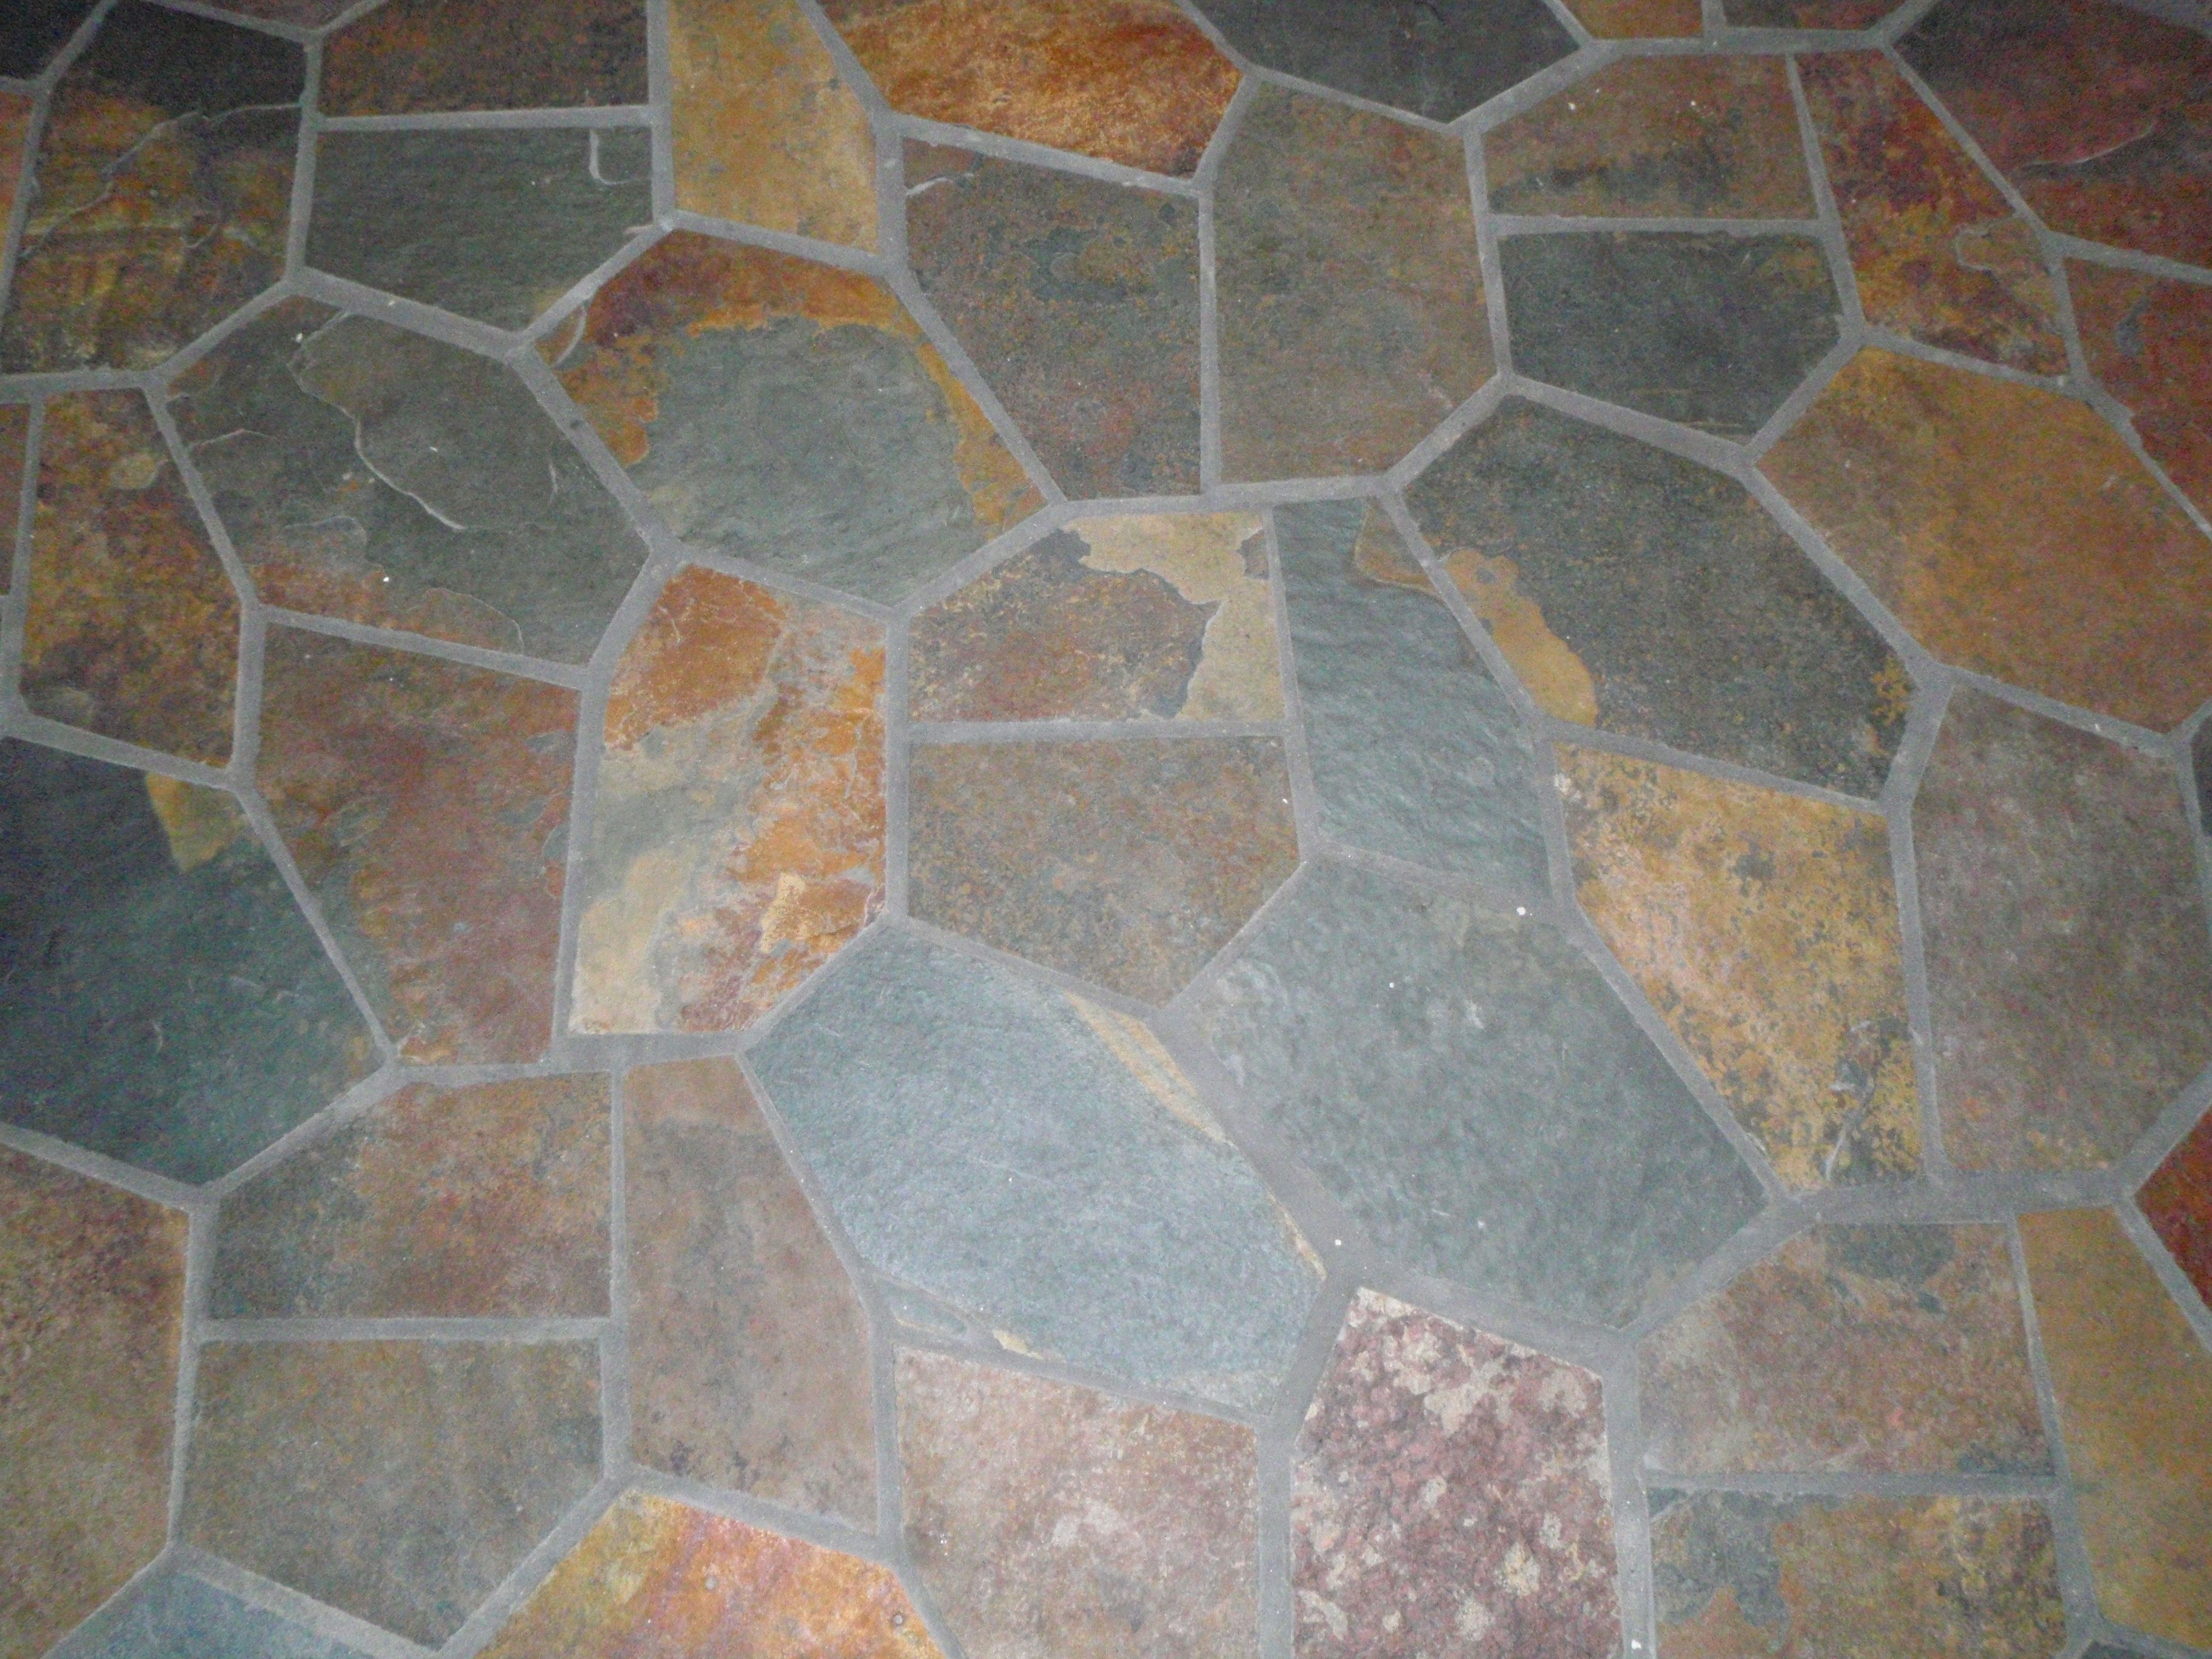 Slate flooring random slate tile with heated floor home slate flooring random slate tile with heated floor dailygadgetfo Gallery